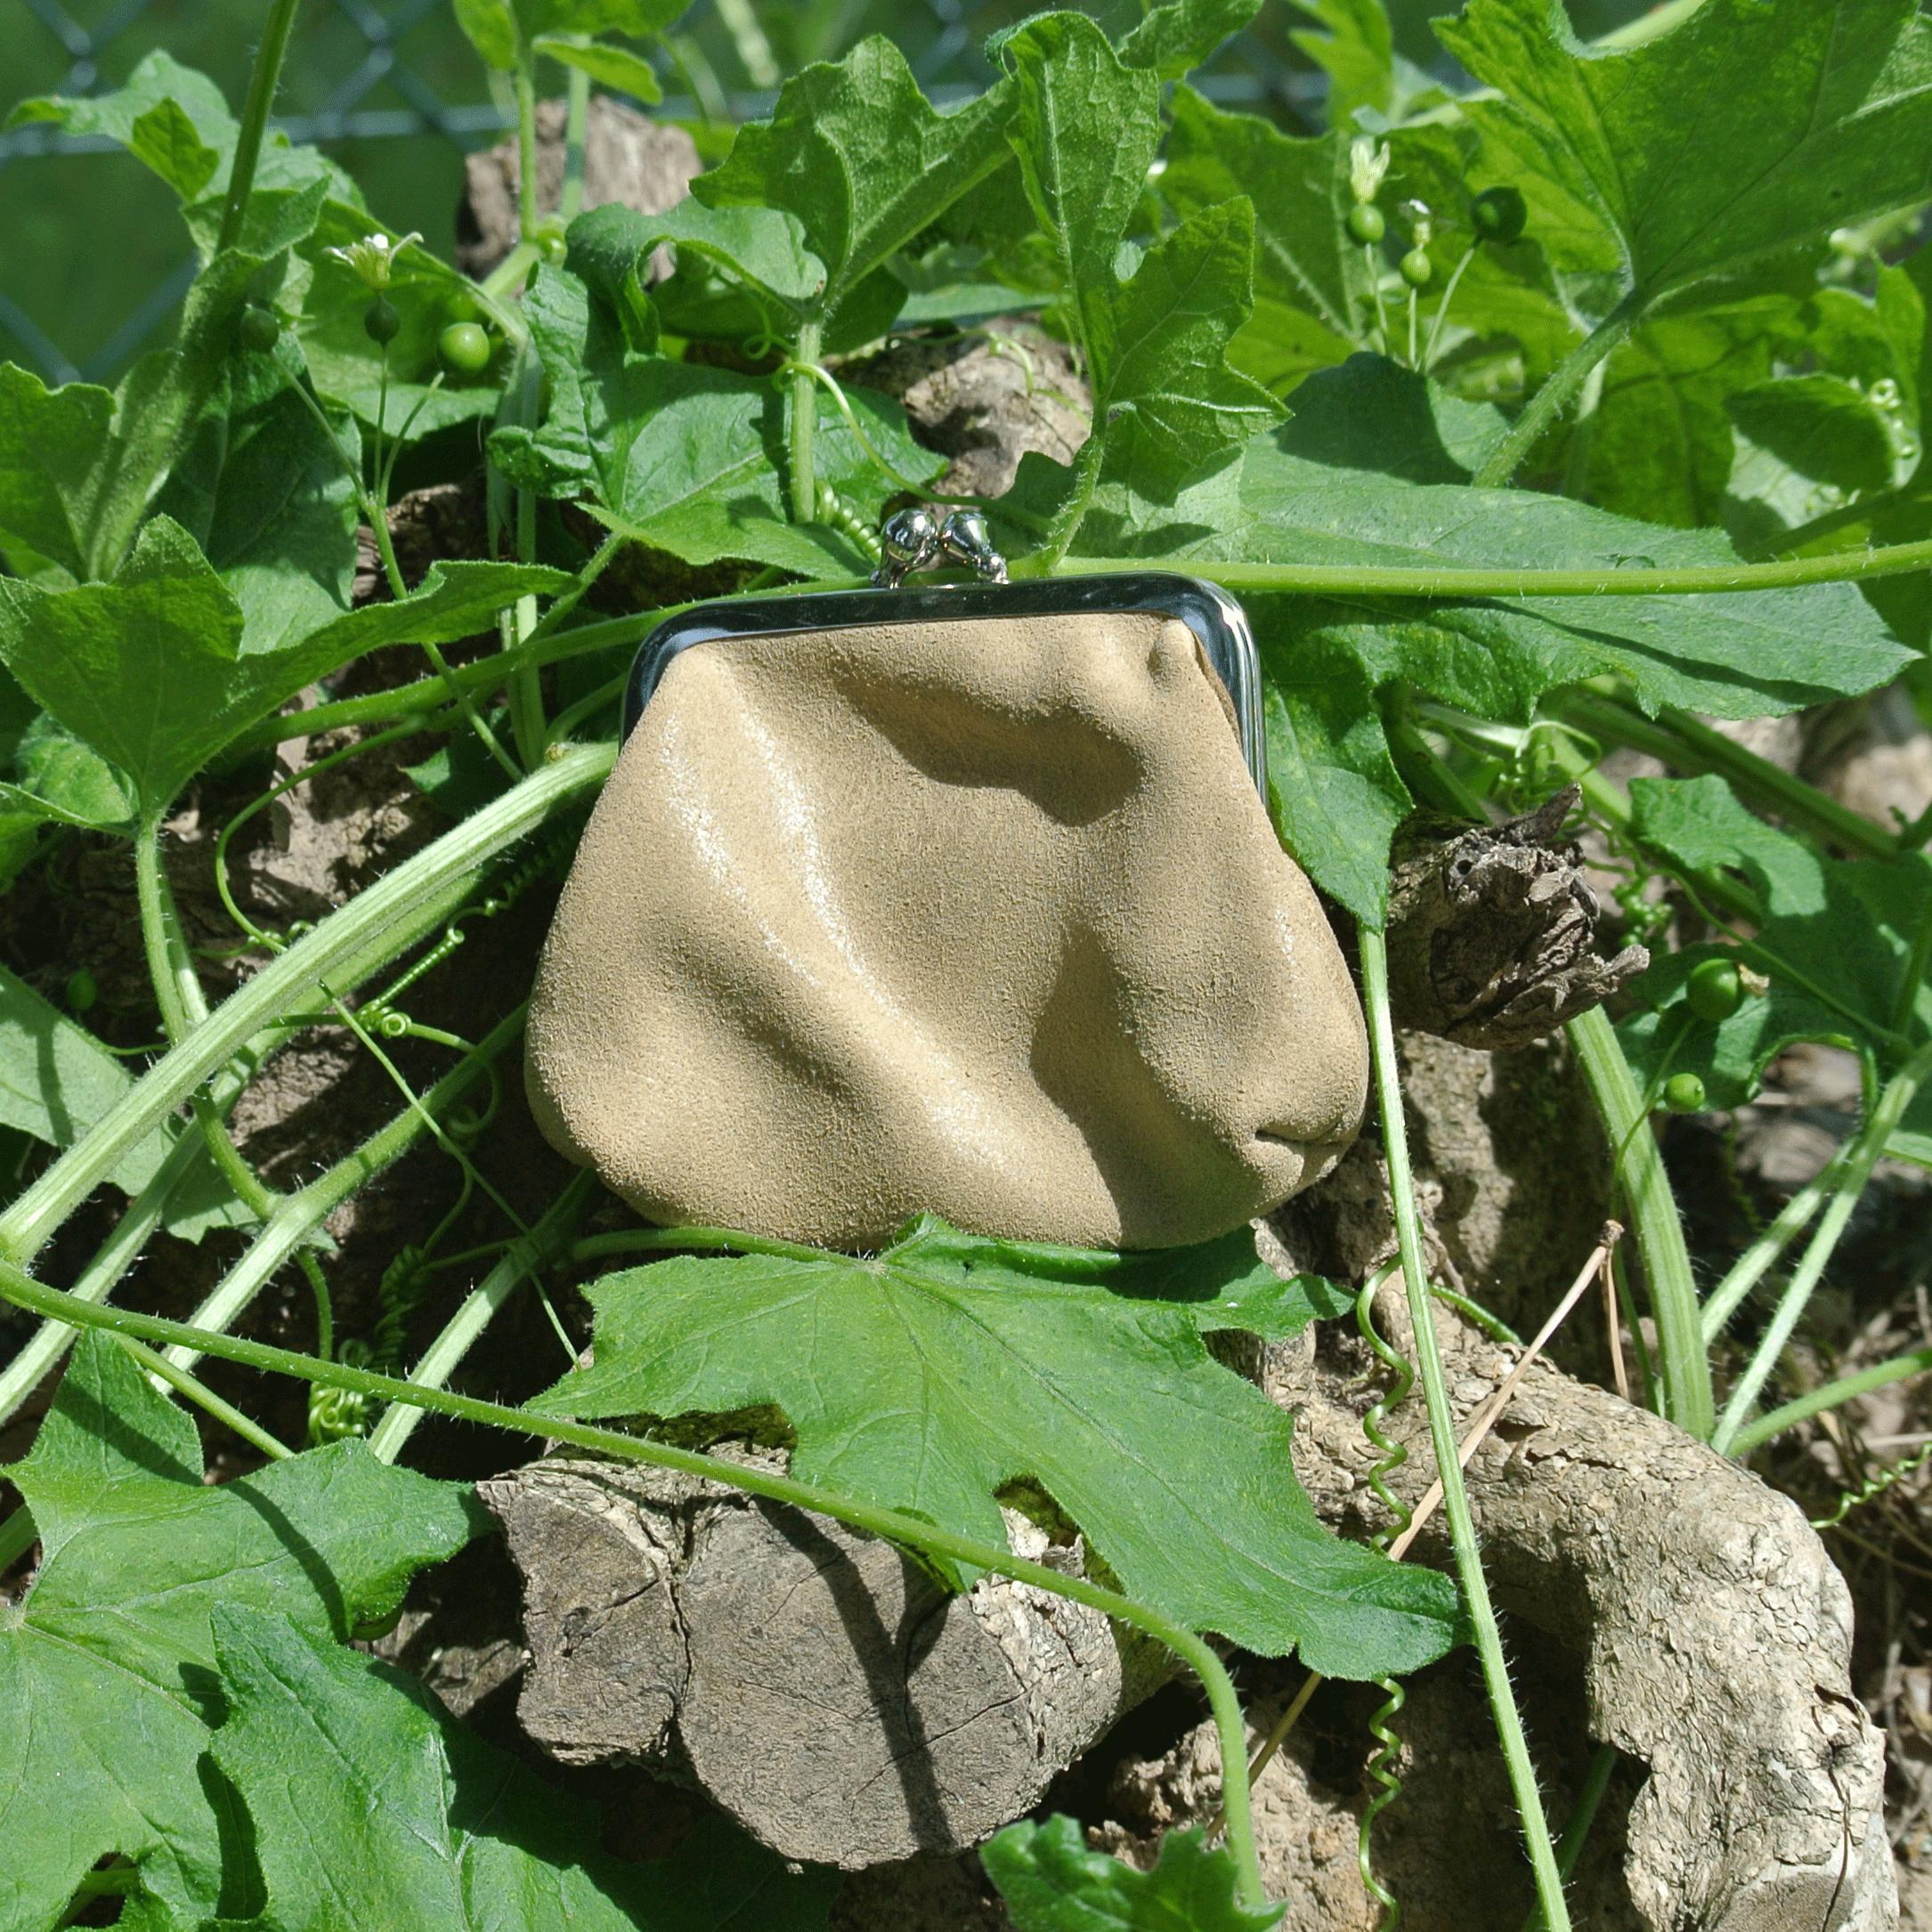 la-cartabliere-fabrique-en-france-made-in-france-porte-monnaie-reine-en-cuir-retro-beige-coquillage